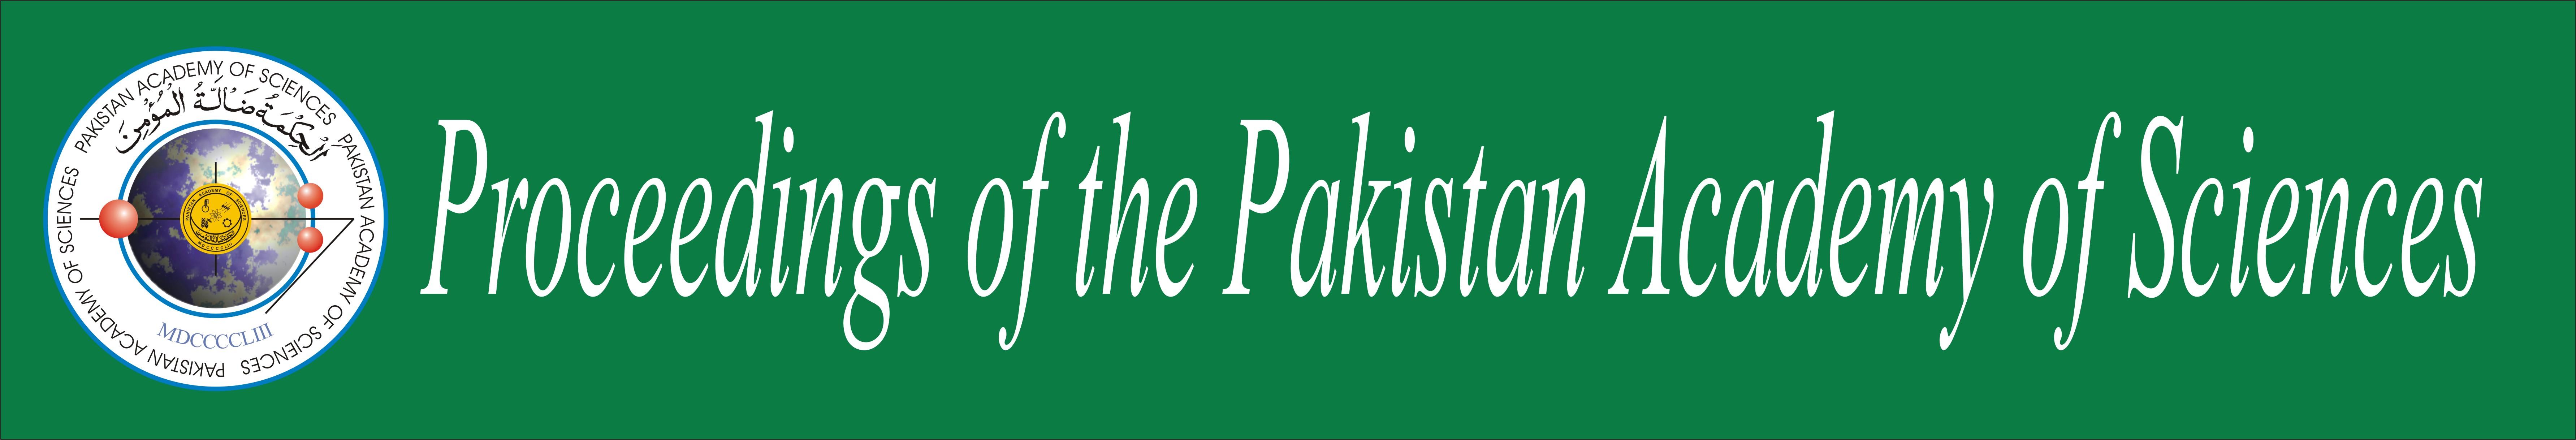 Proceedings of the Pakistan Academy of Sciences